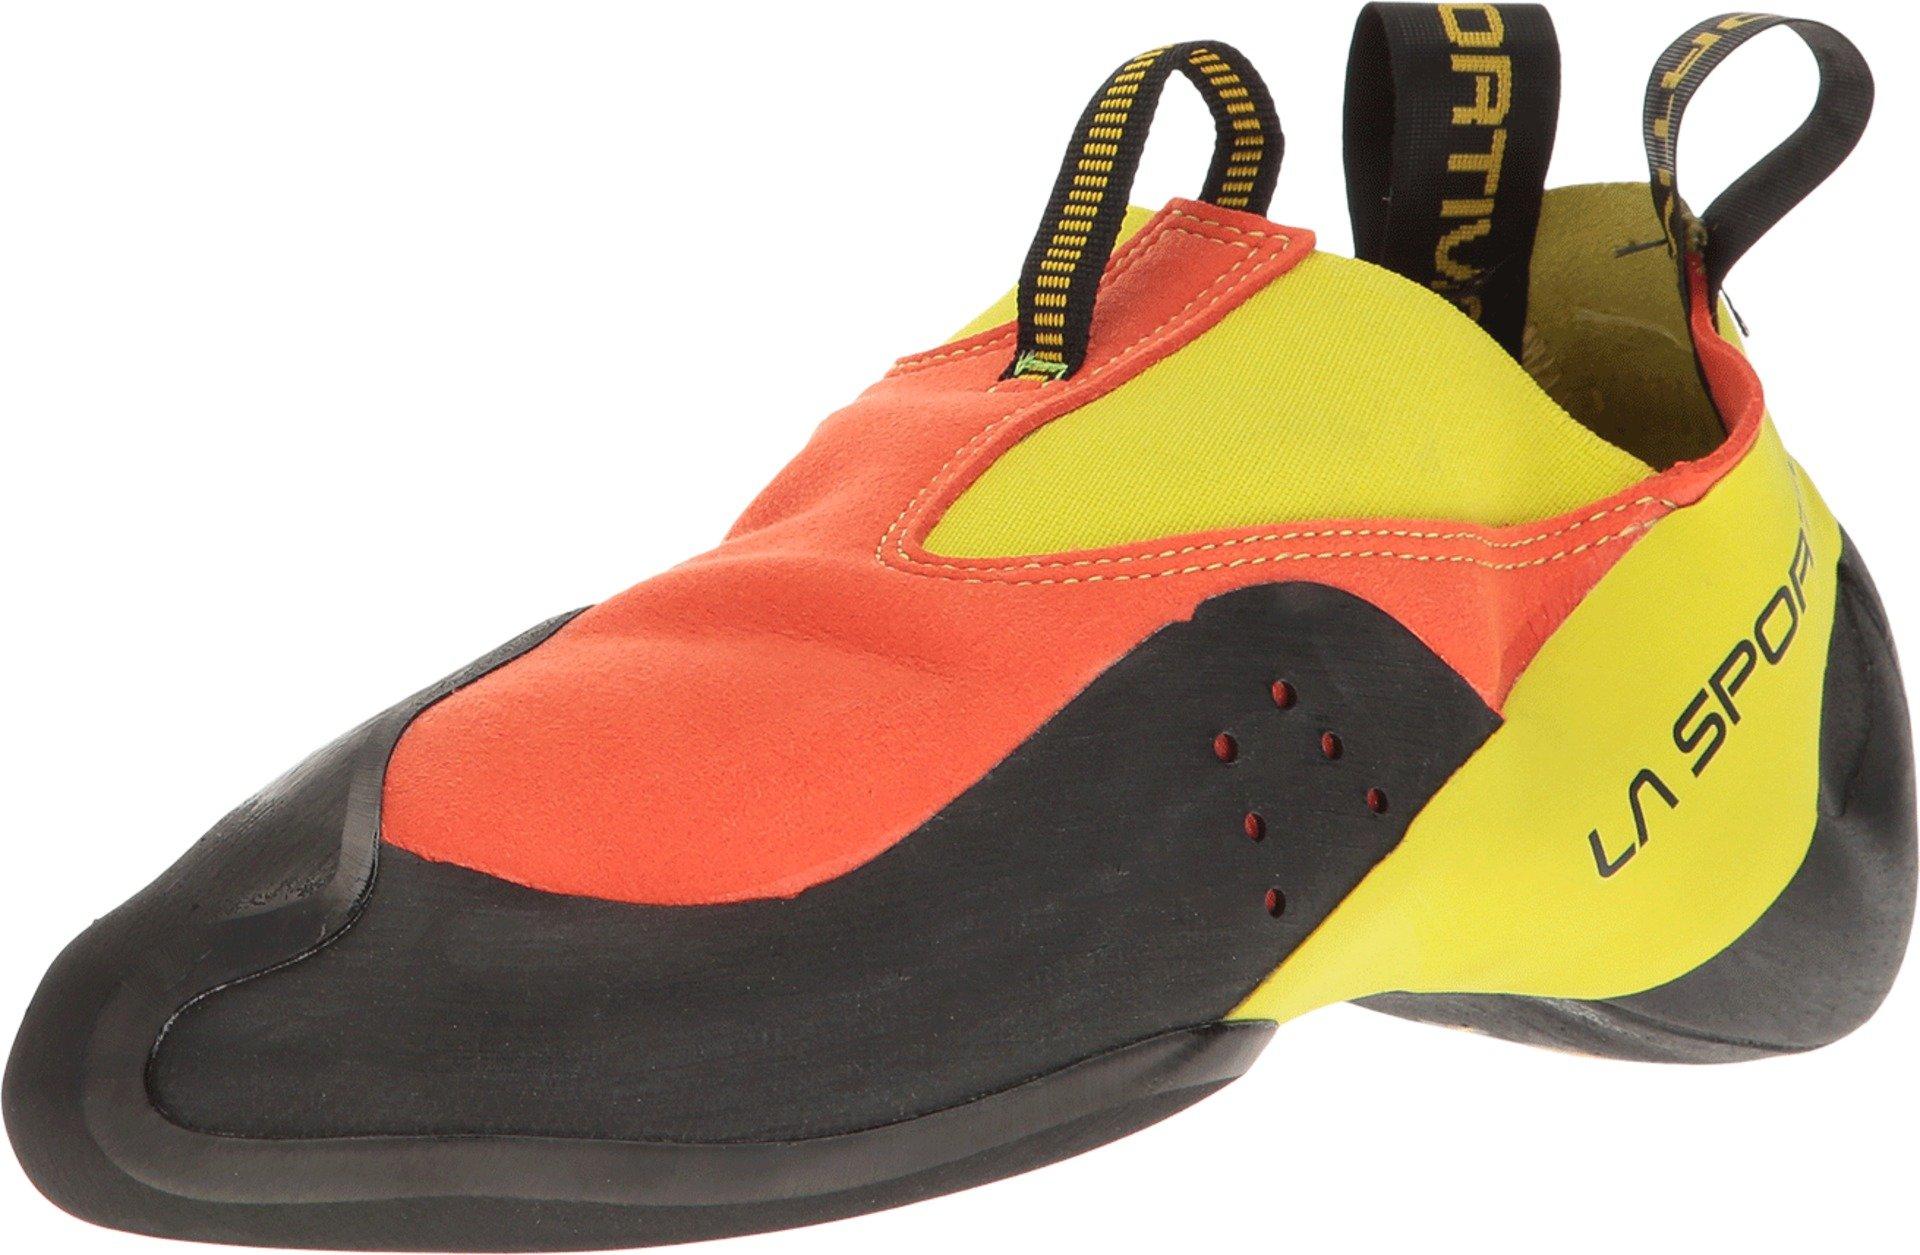 La Sportiva MAVERINK Climbing Shoe, Flame/Sulphur, 40.5 by La Sportiva